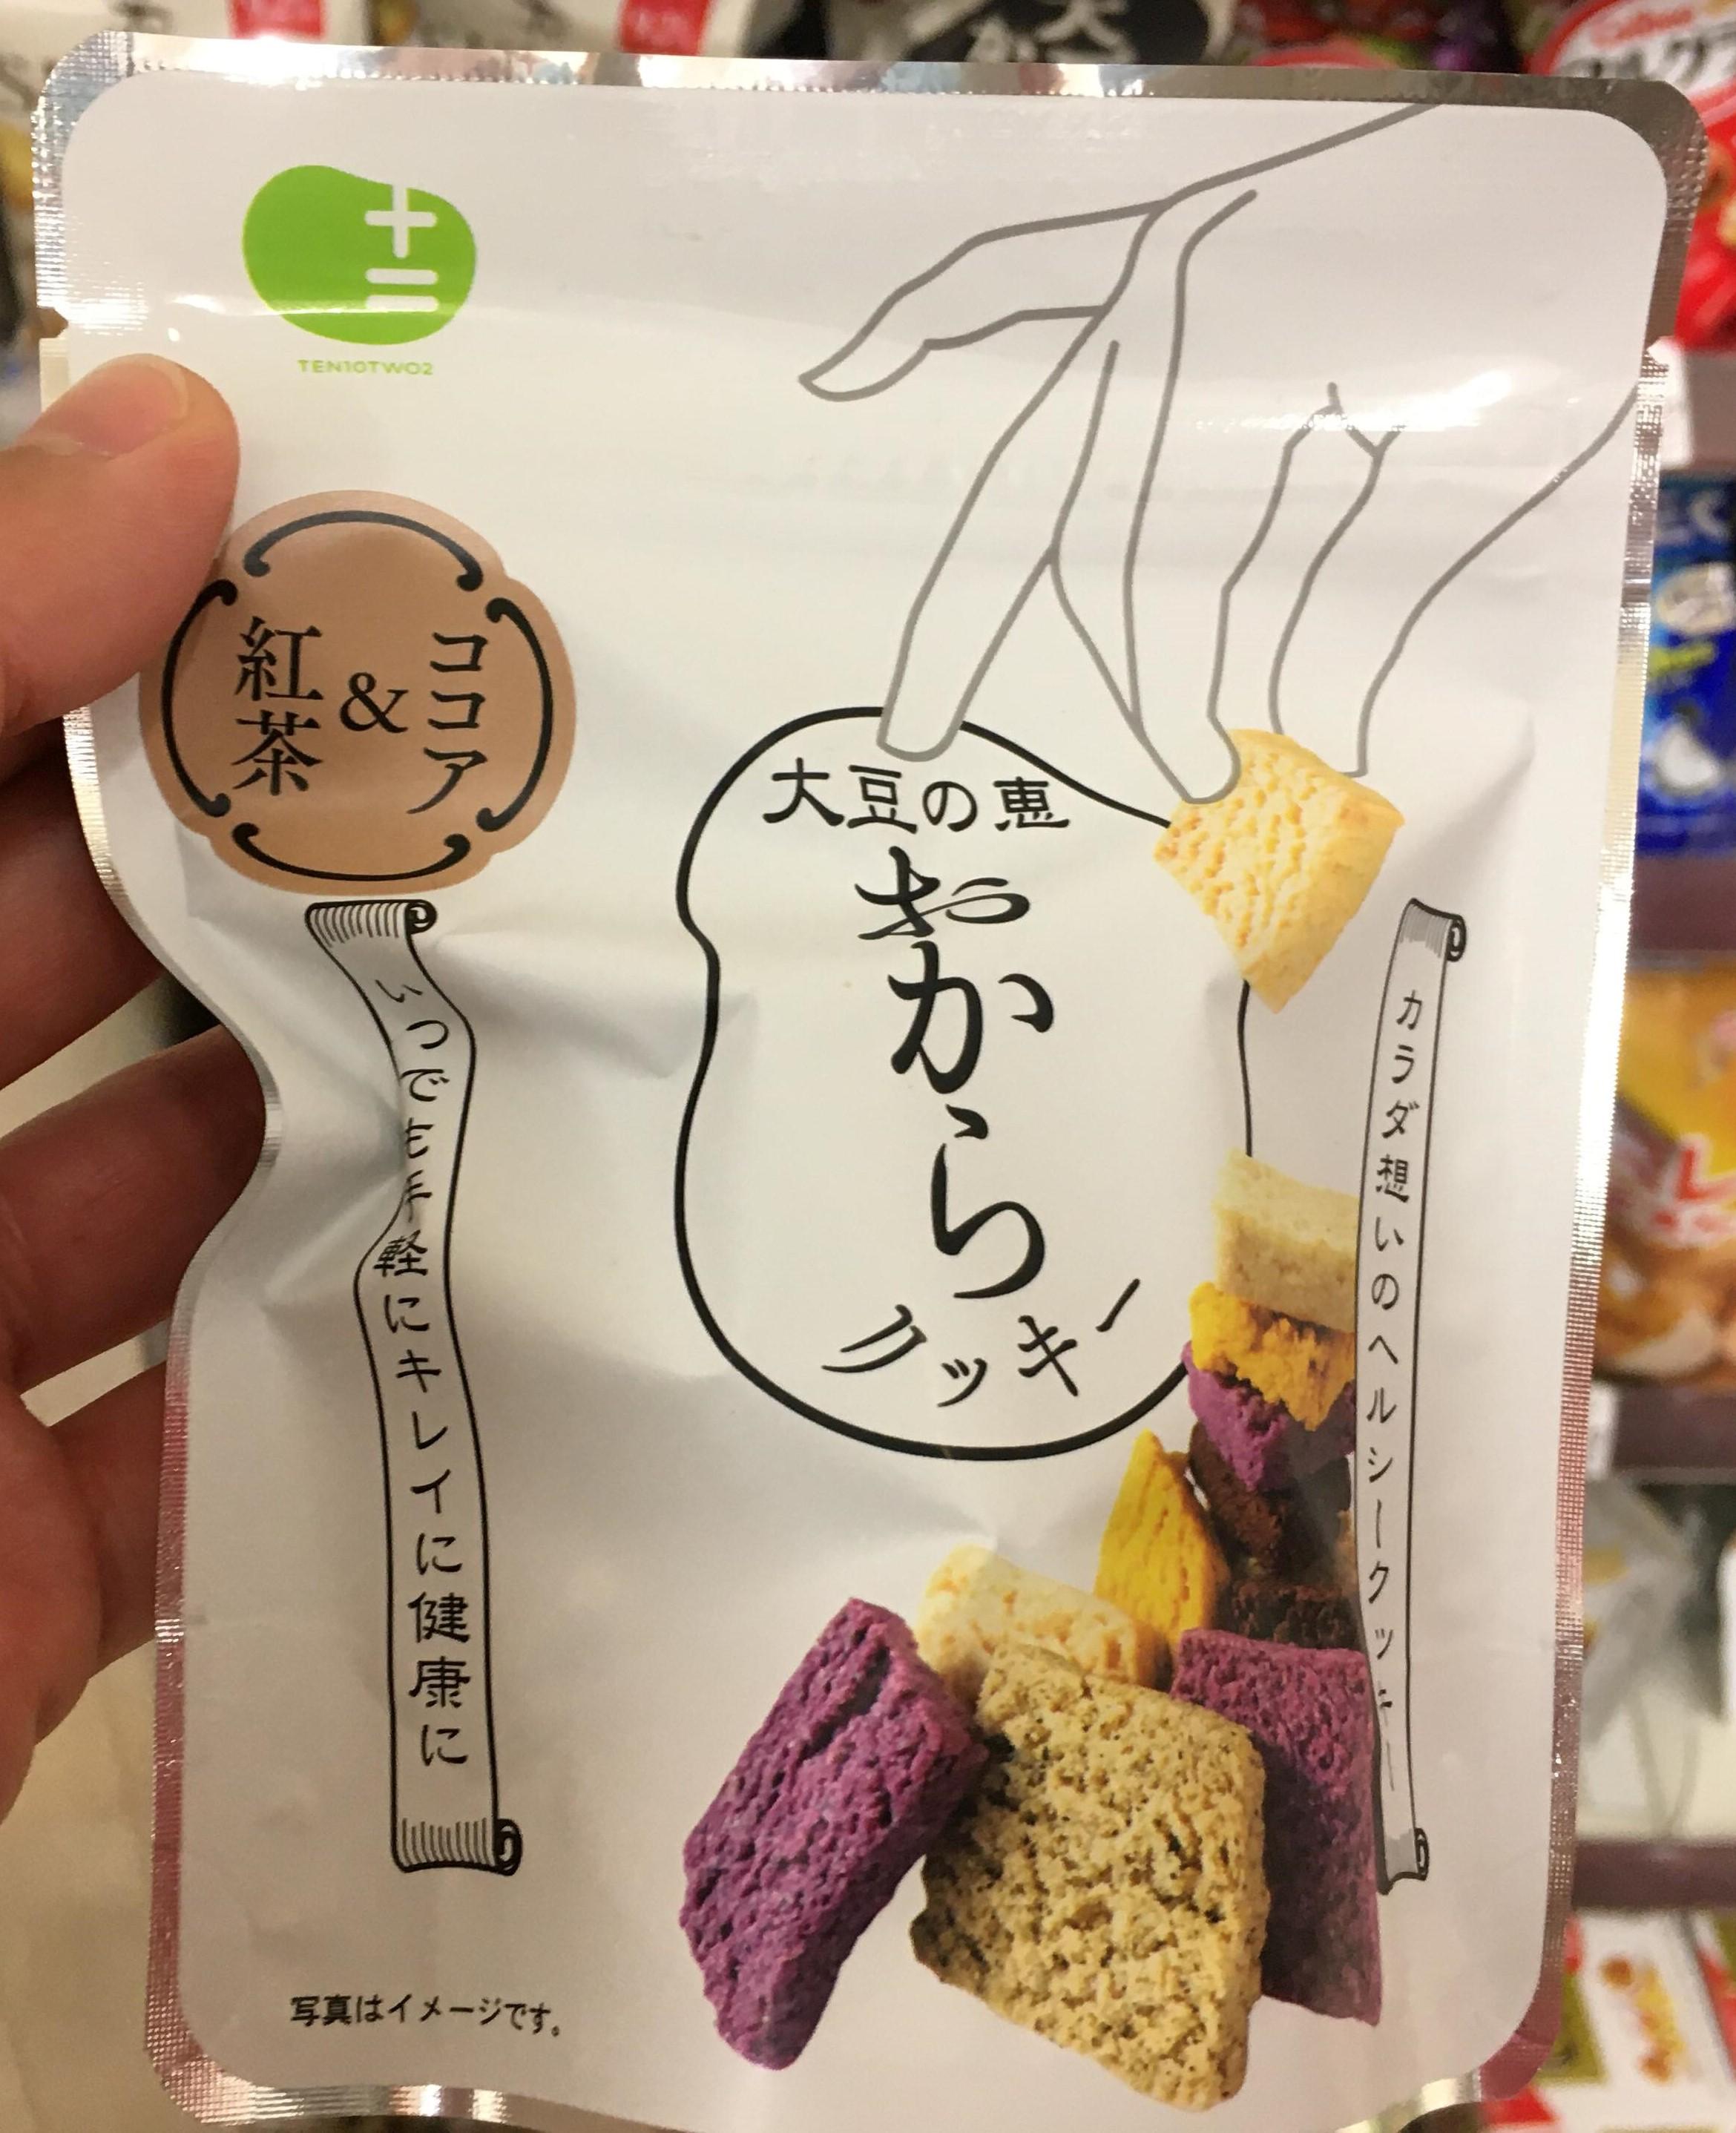 Ten-Two Okara Cocoa & Black Tea Cookies